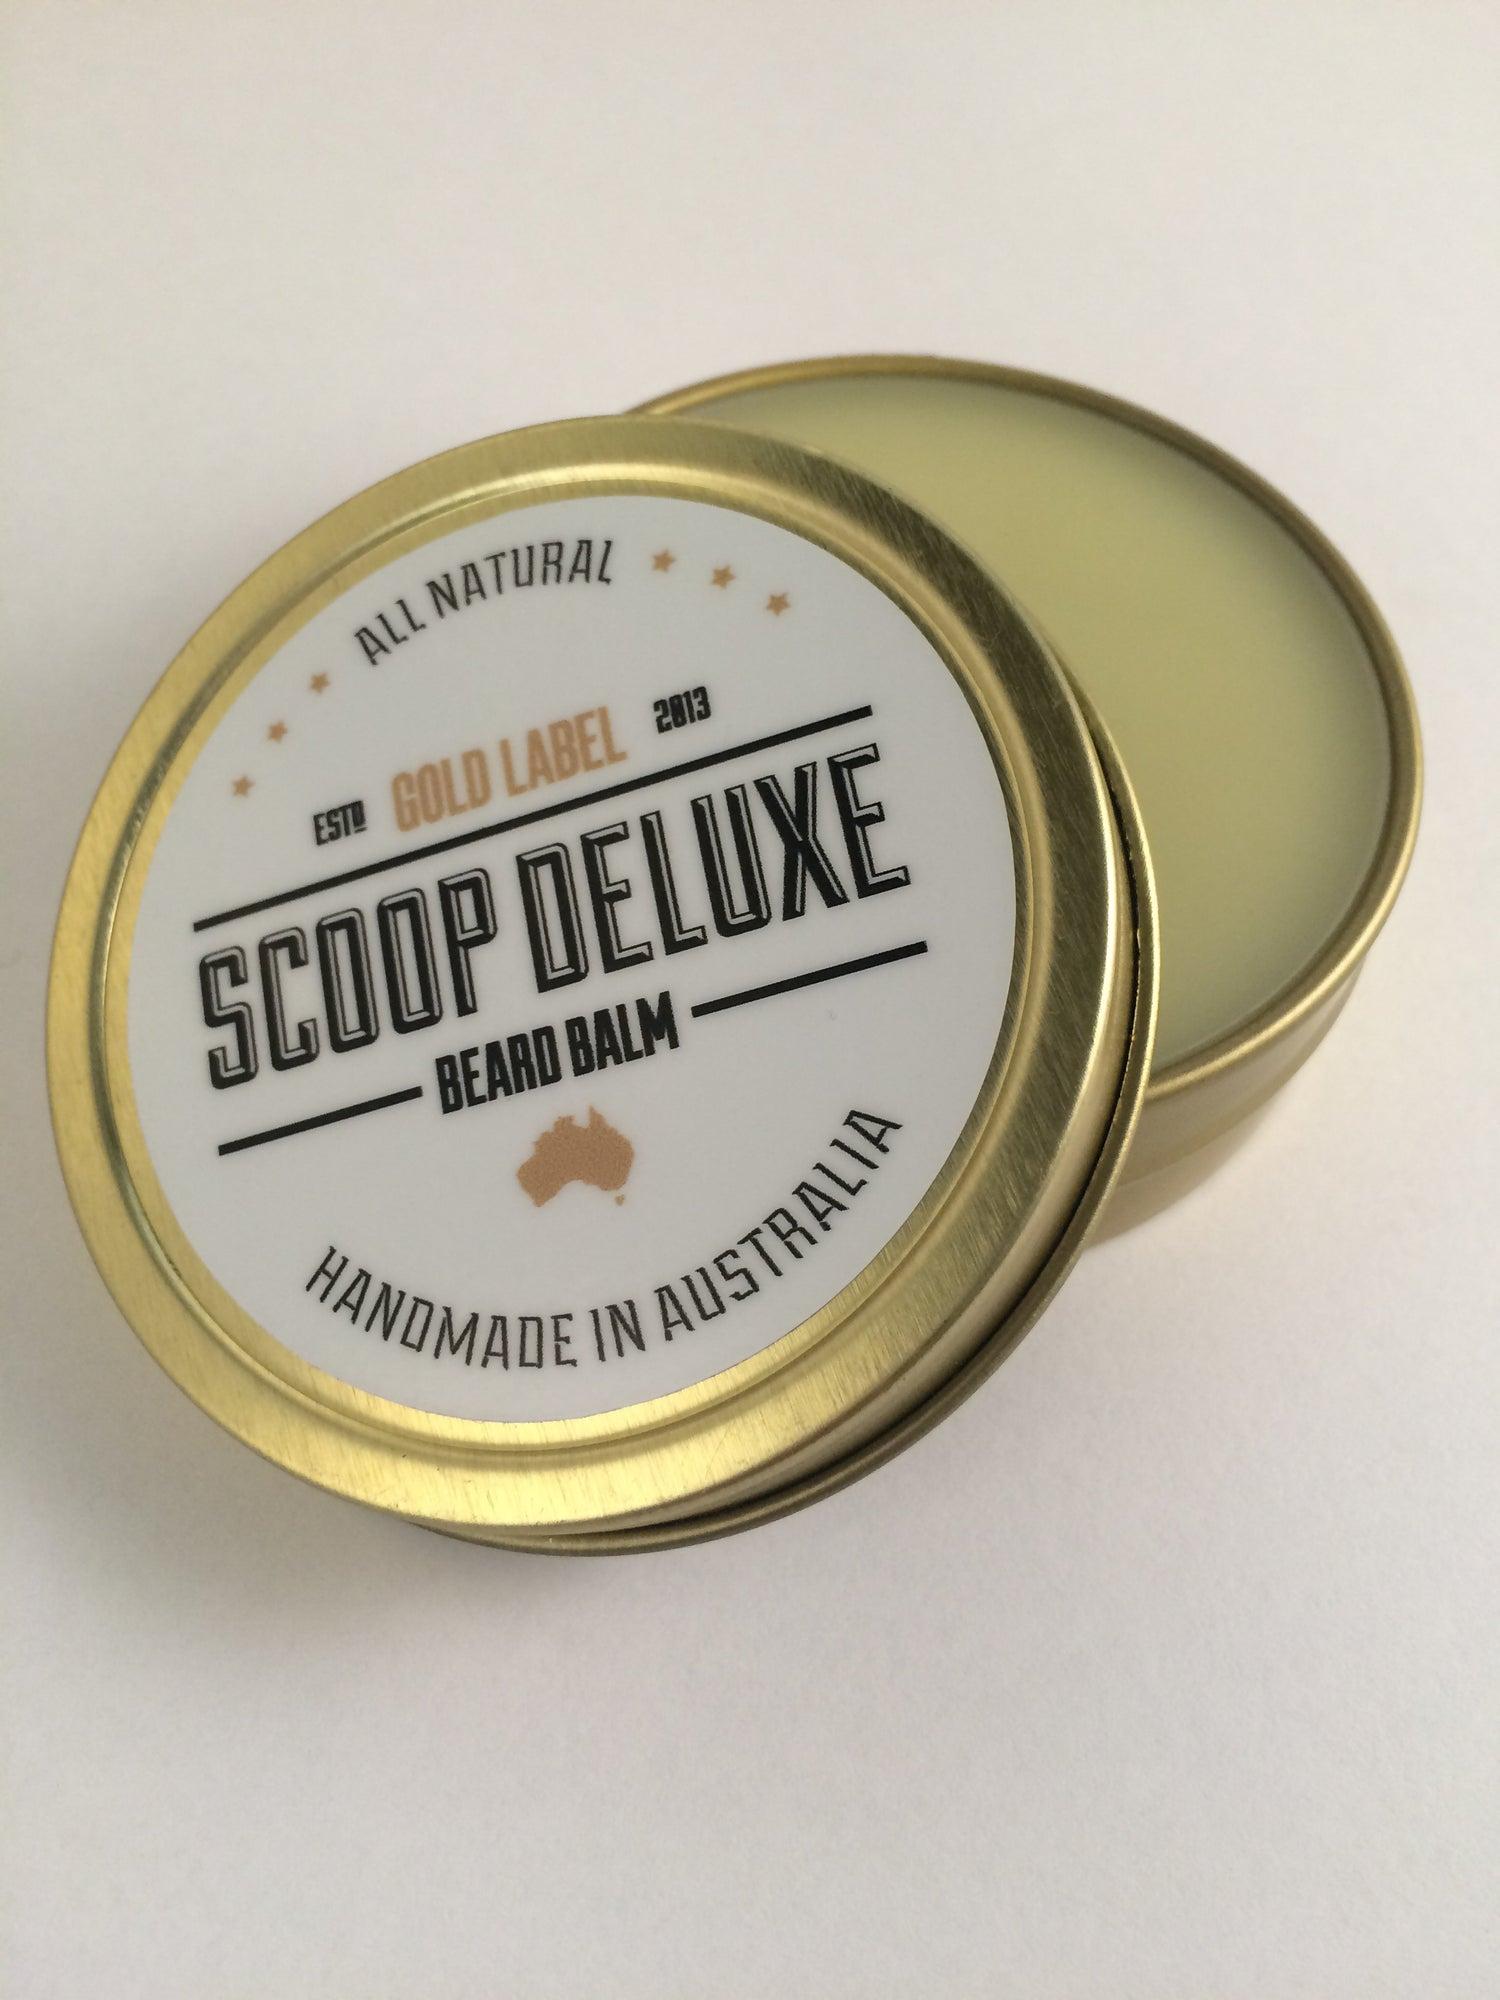 Image of 2oz Scoop Deluxe Beard Balm Gold Label